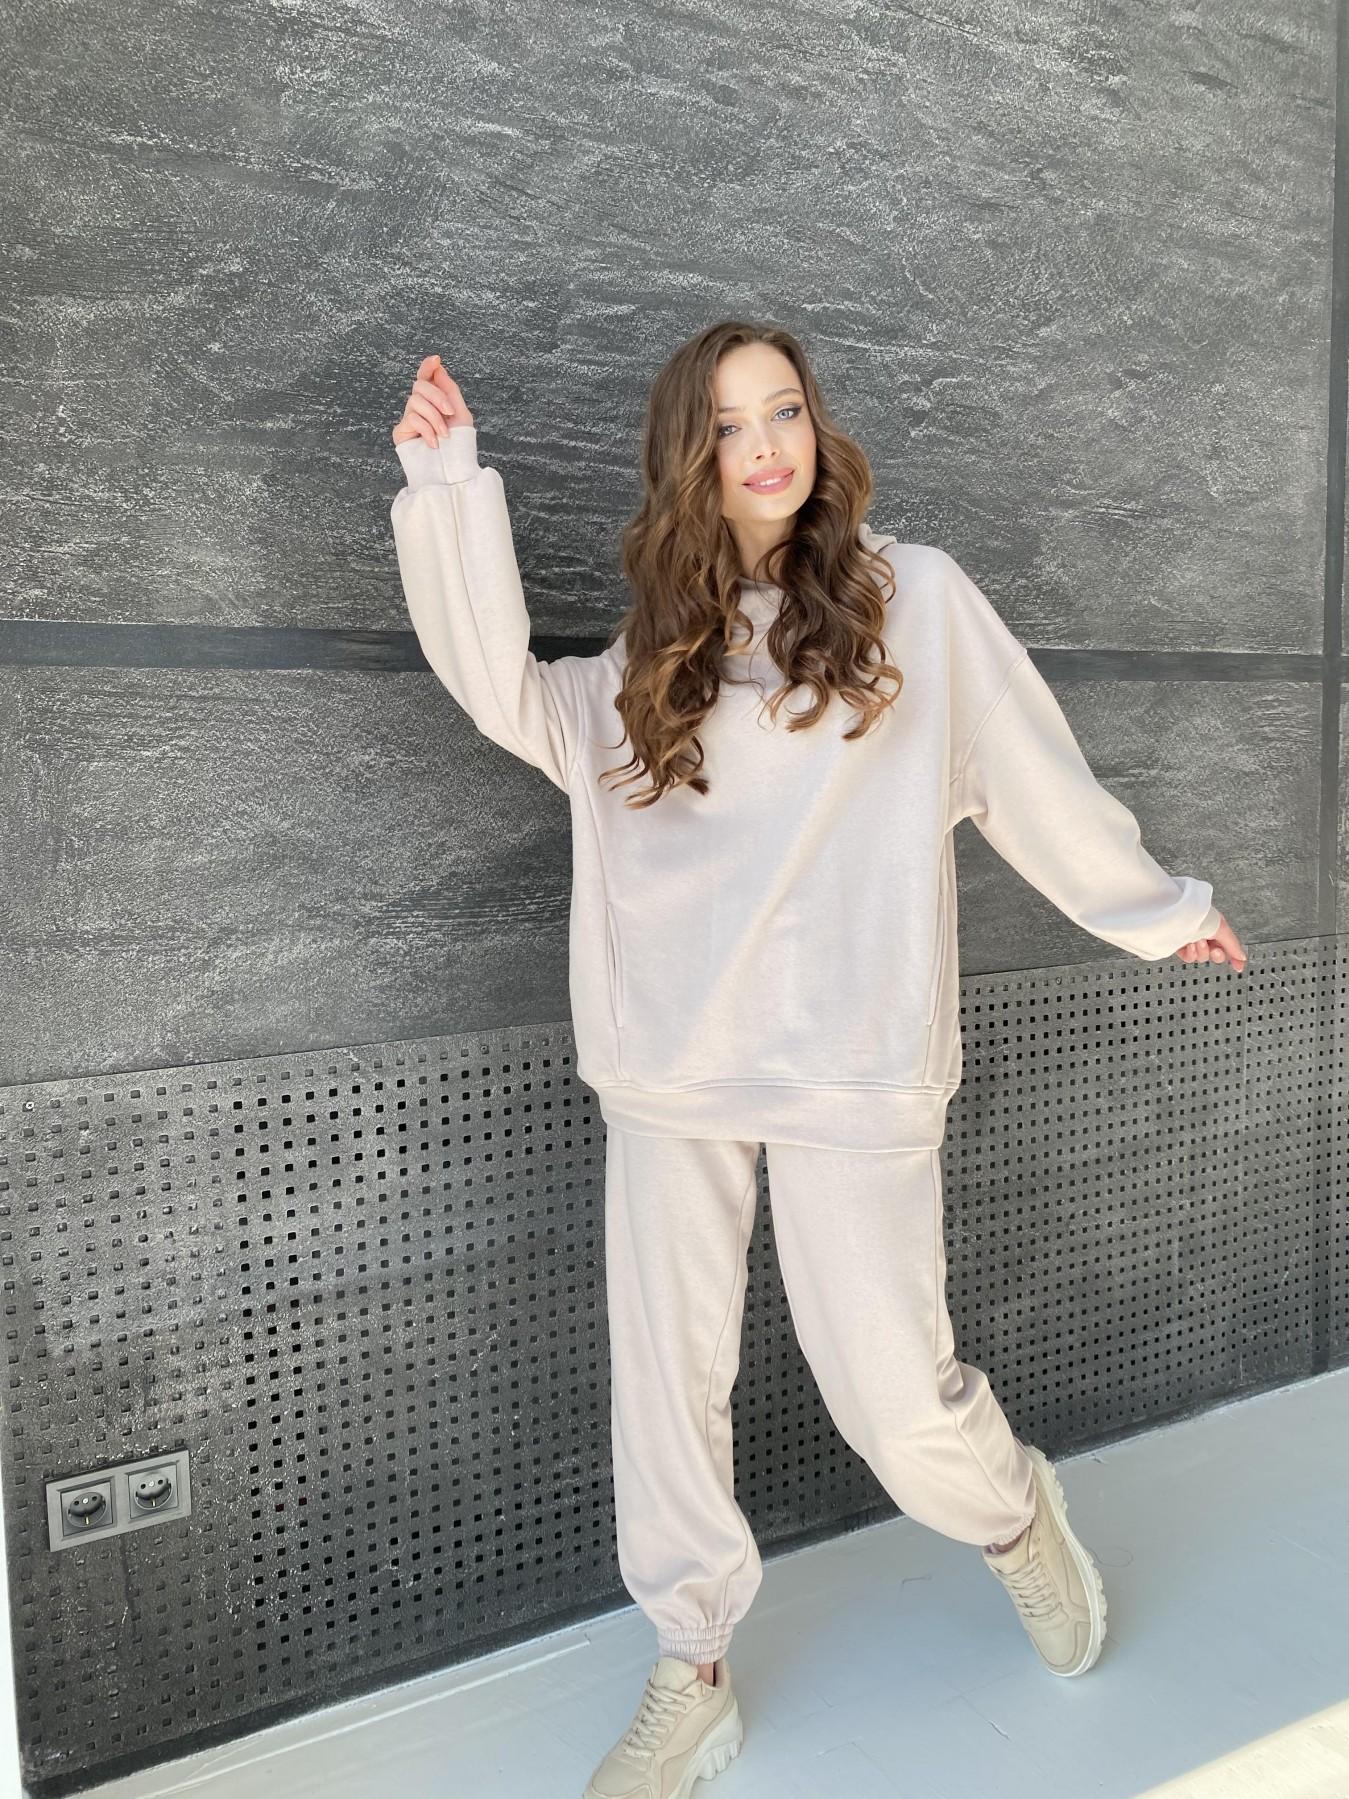 Марион костюм из 3х нитки 10581 АРТ. 46936 Цвет: Бежевый - фото 4, интернет магазин tm-modus.ru